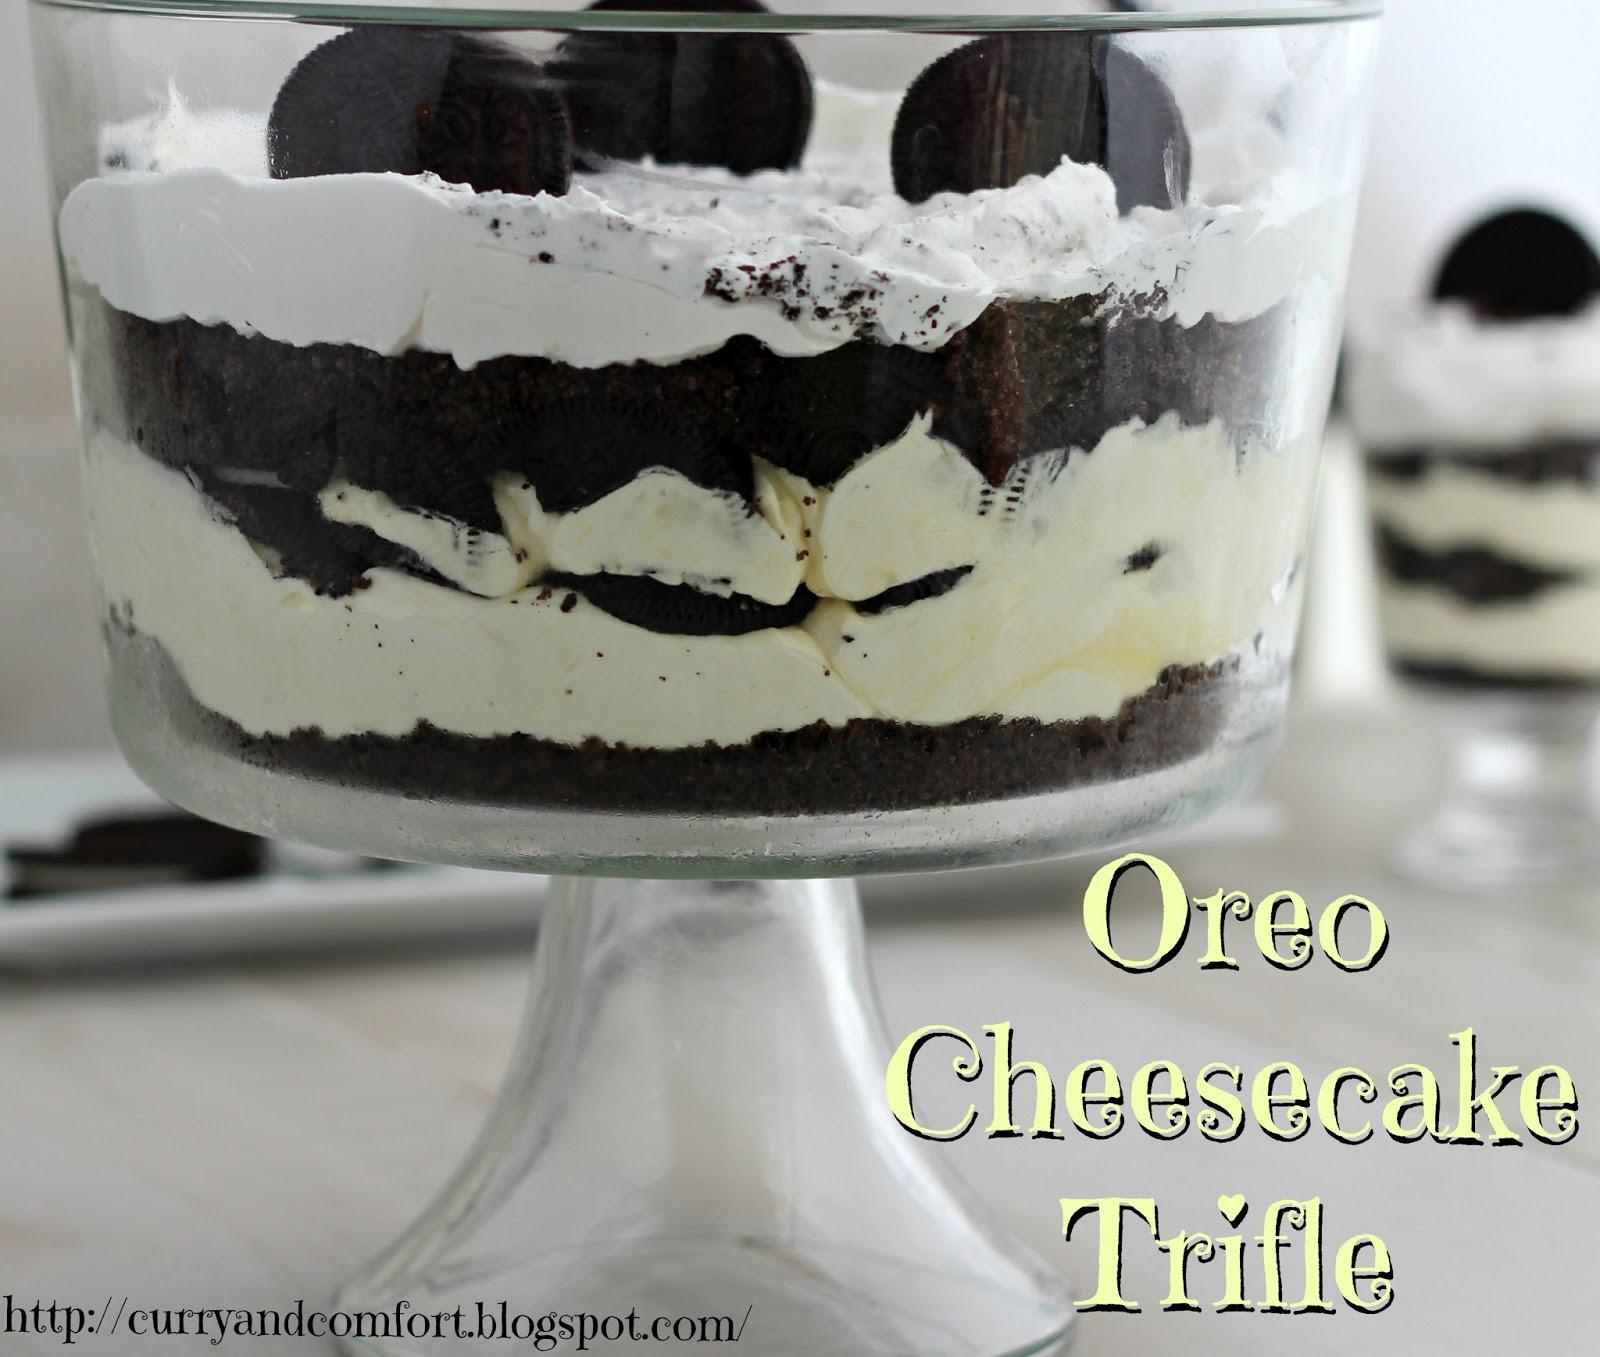 Recipe for oreo cream cheese cake